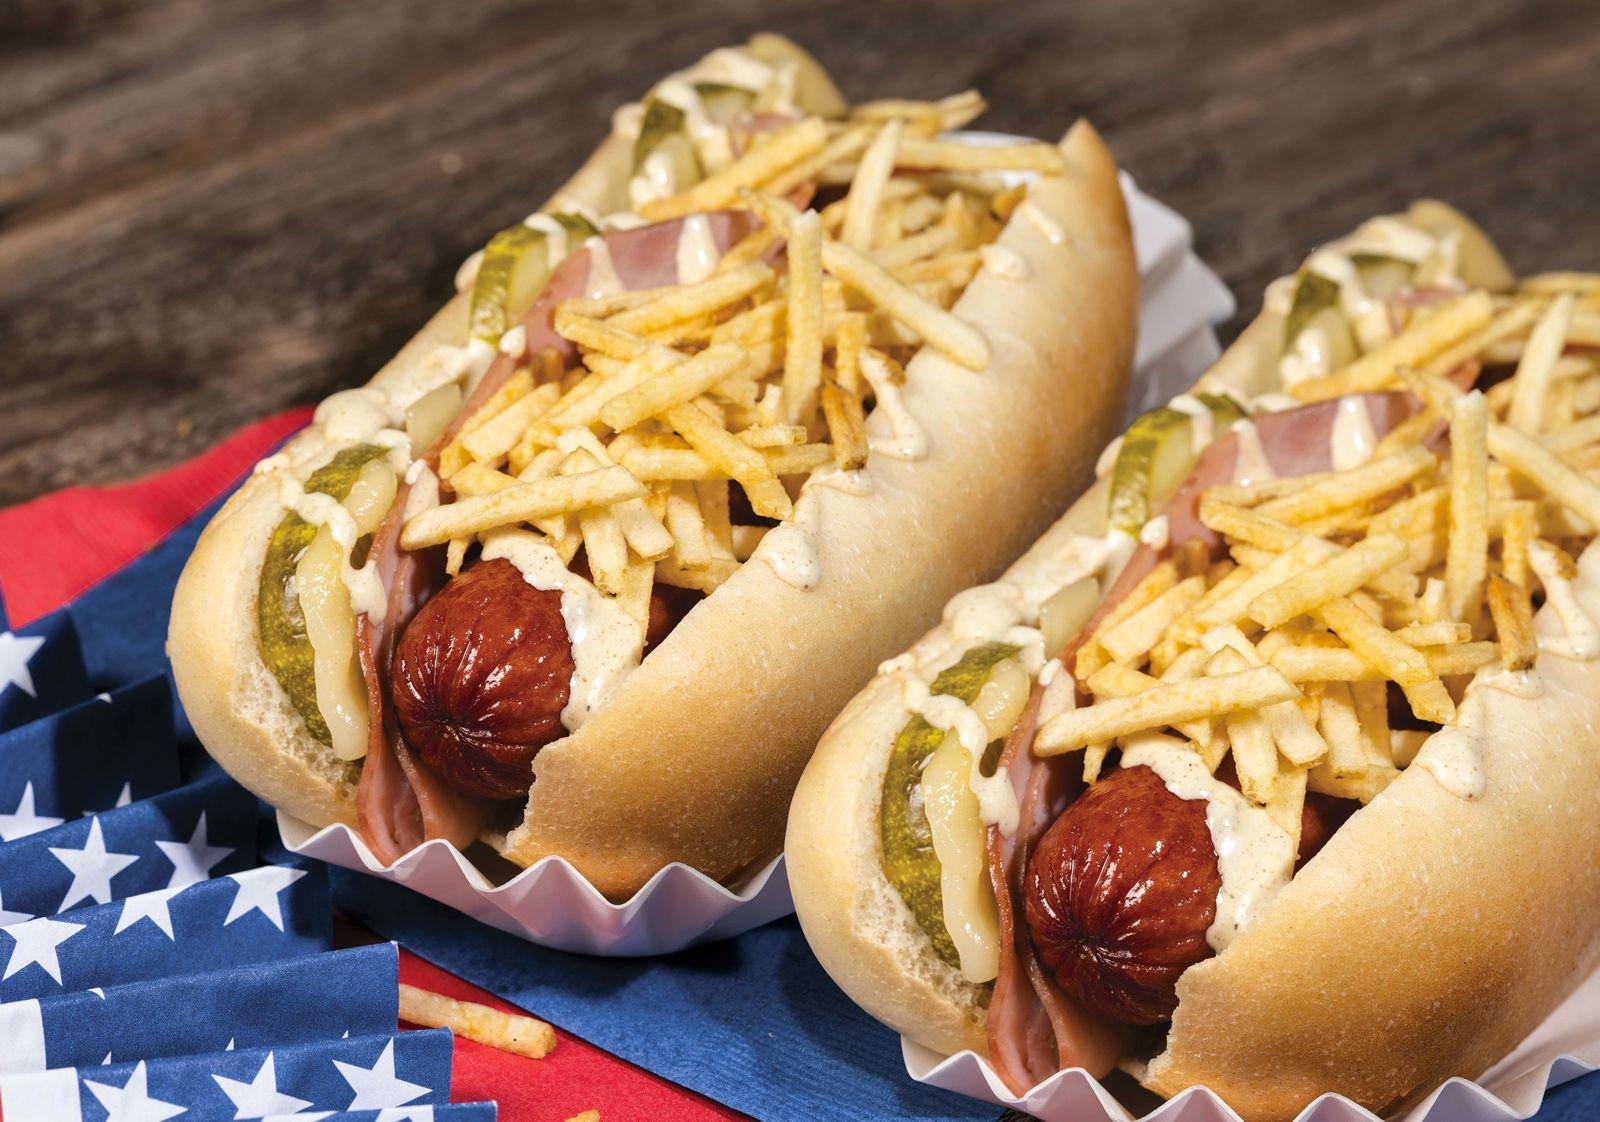 When An American Classic Meets A Cuban Staple, You Get Pollo Tropical's New Cuban Hot Dog